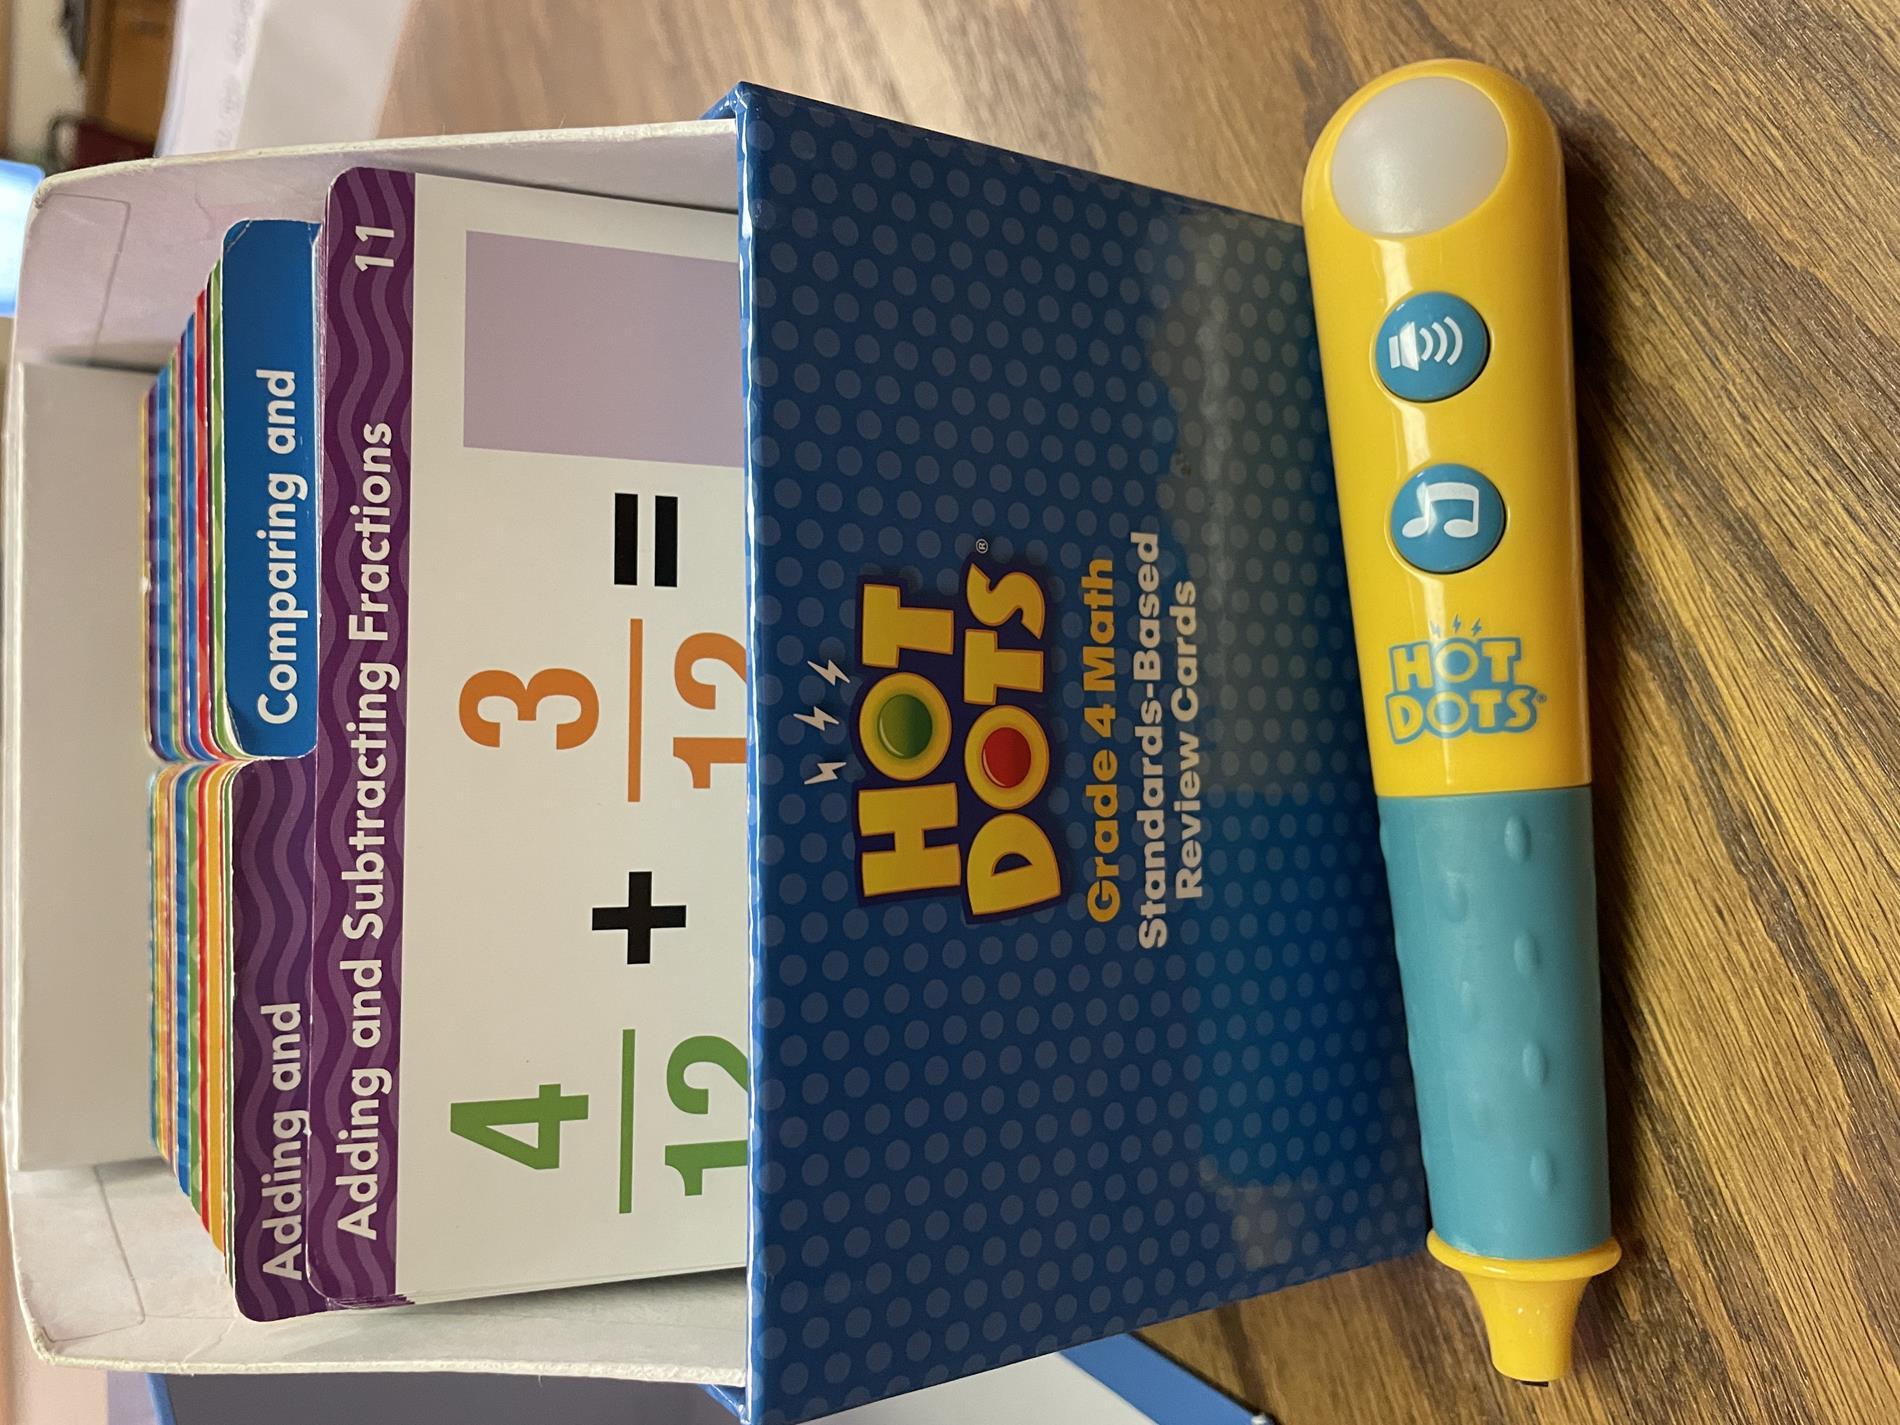 hot dots 4th grade math review